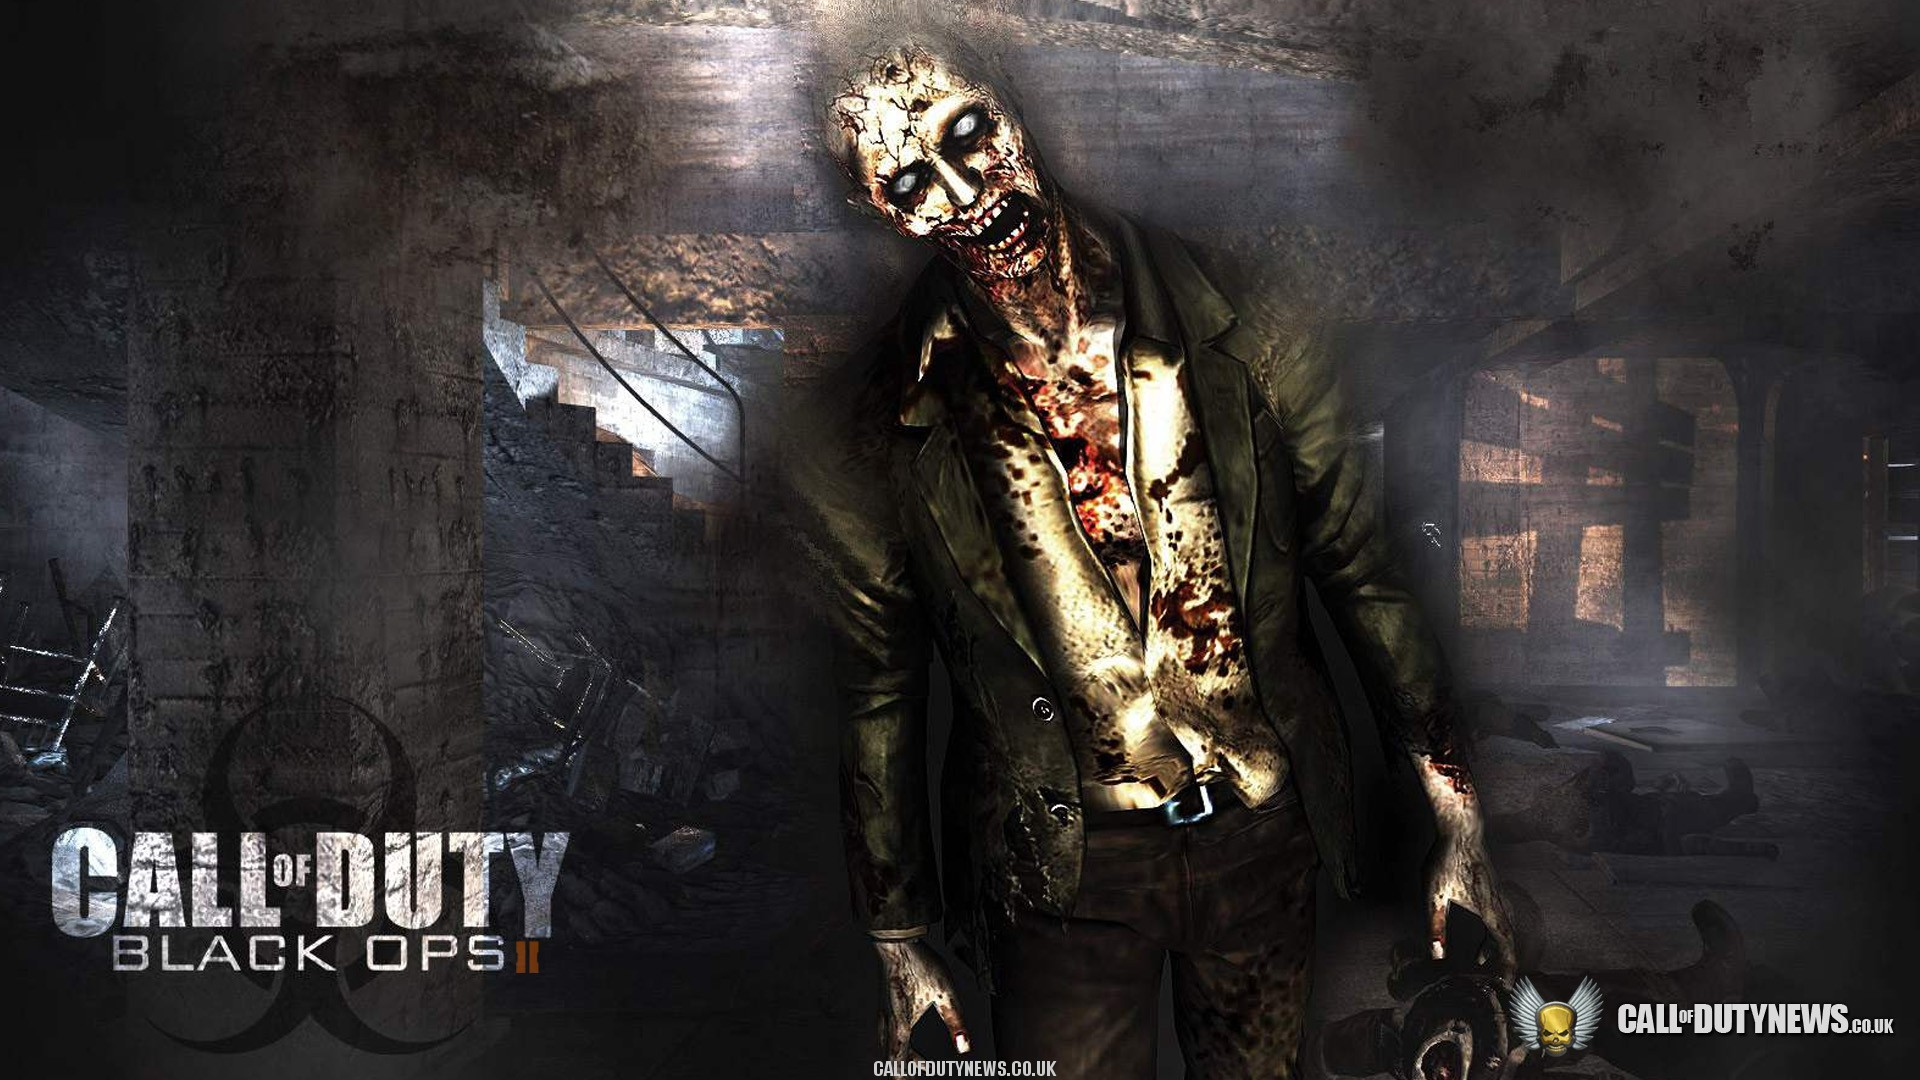 49 Black Ops 3 Zombie Wallpaper On Wallpapersafari